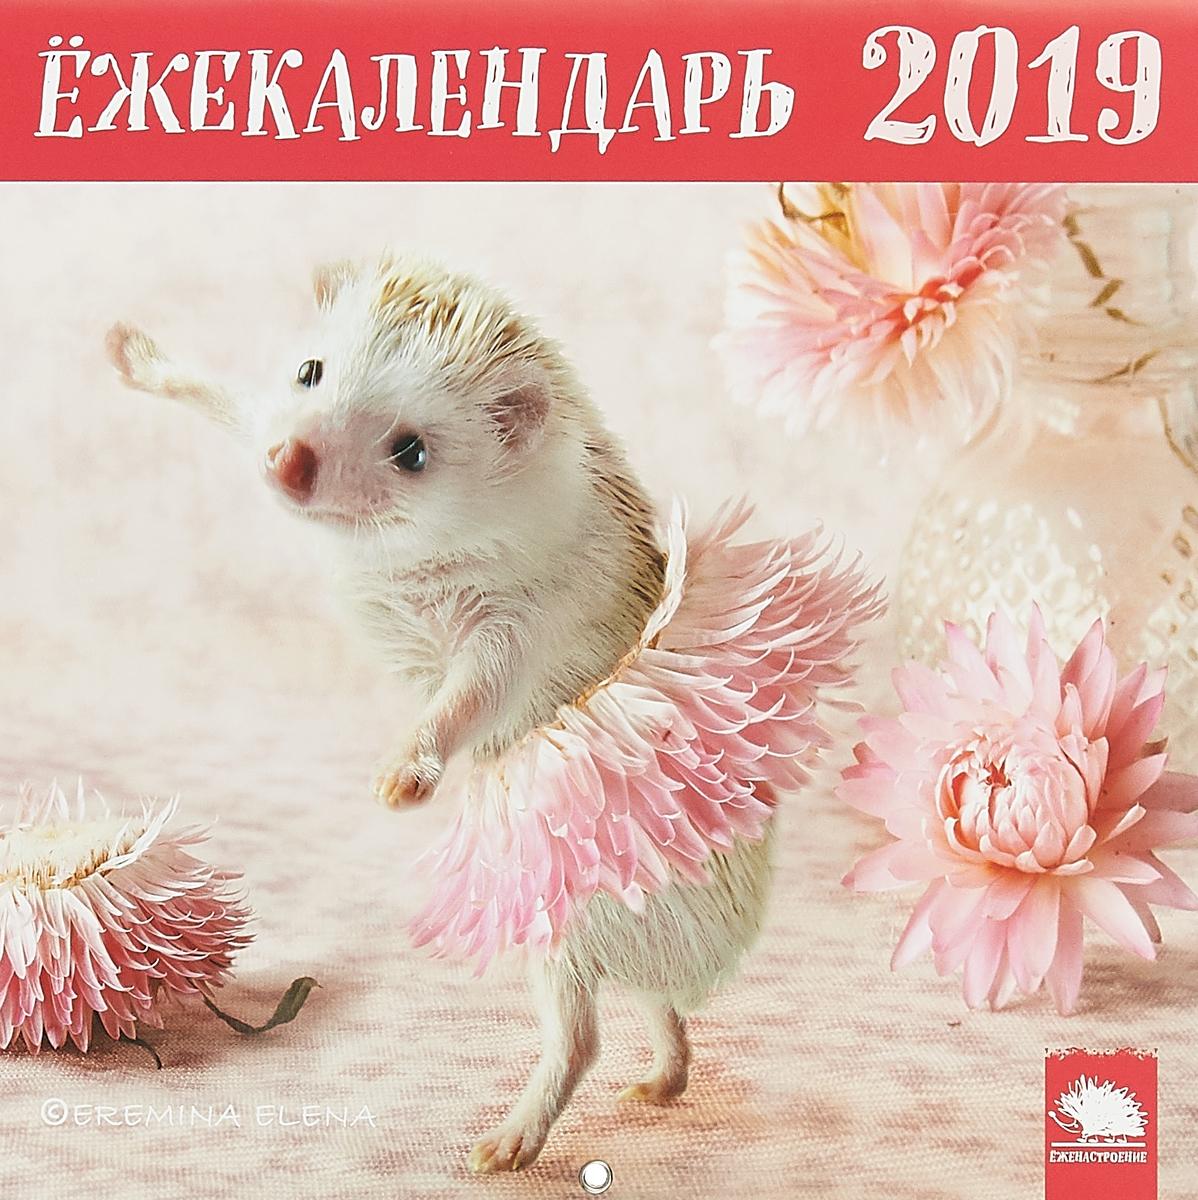 Ёжекалендарь 2019